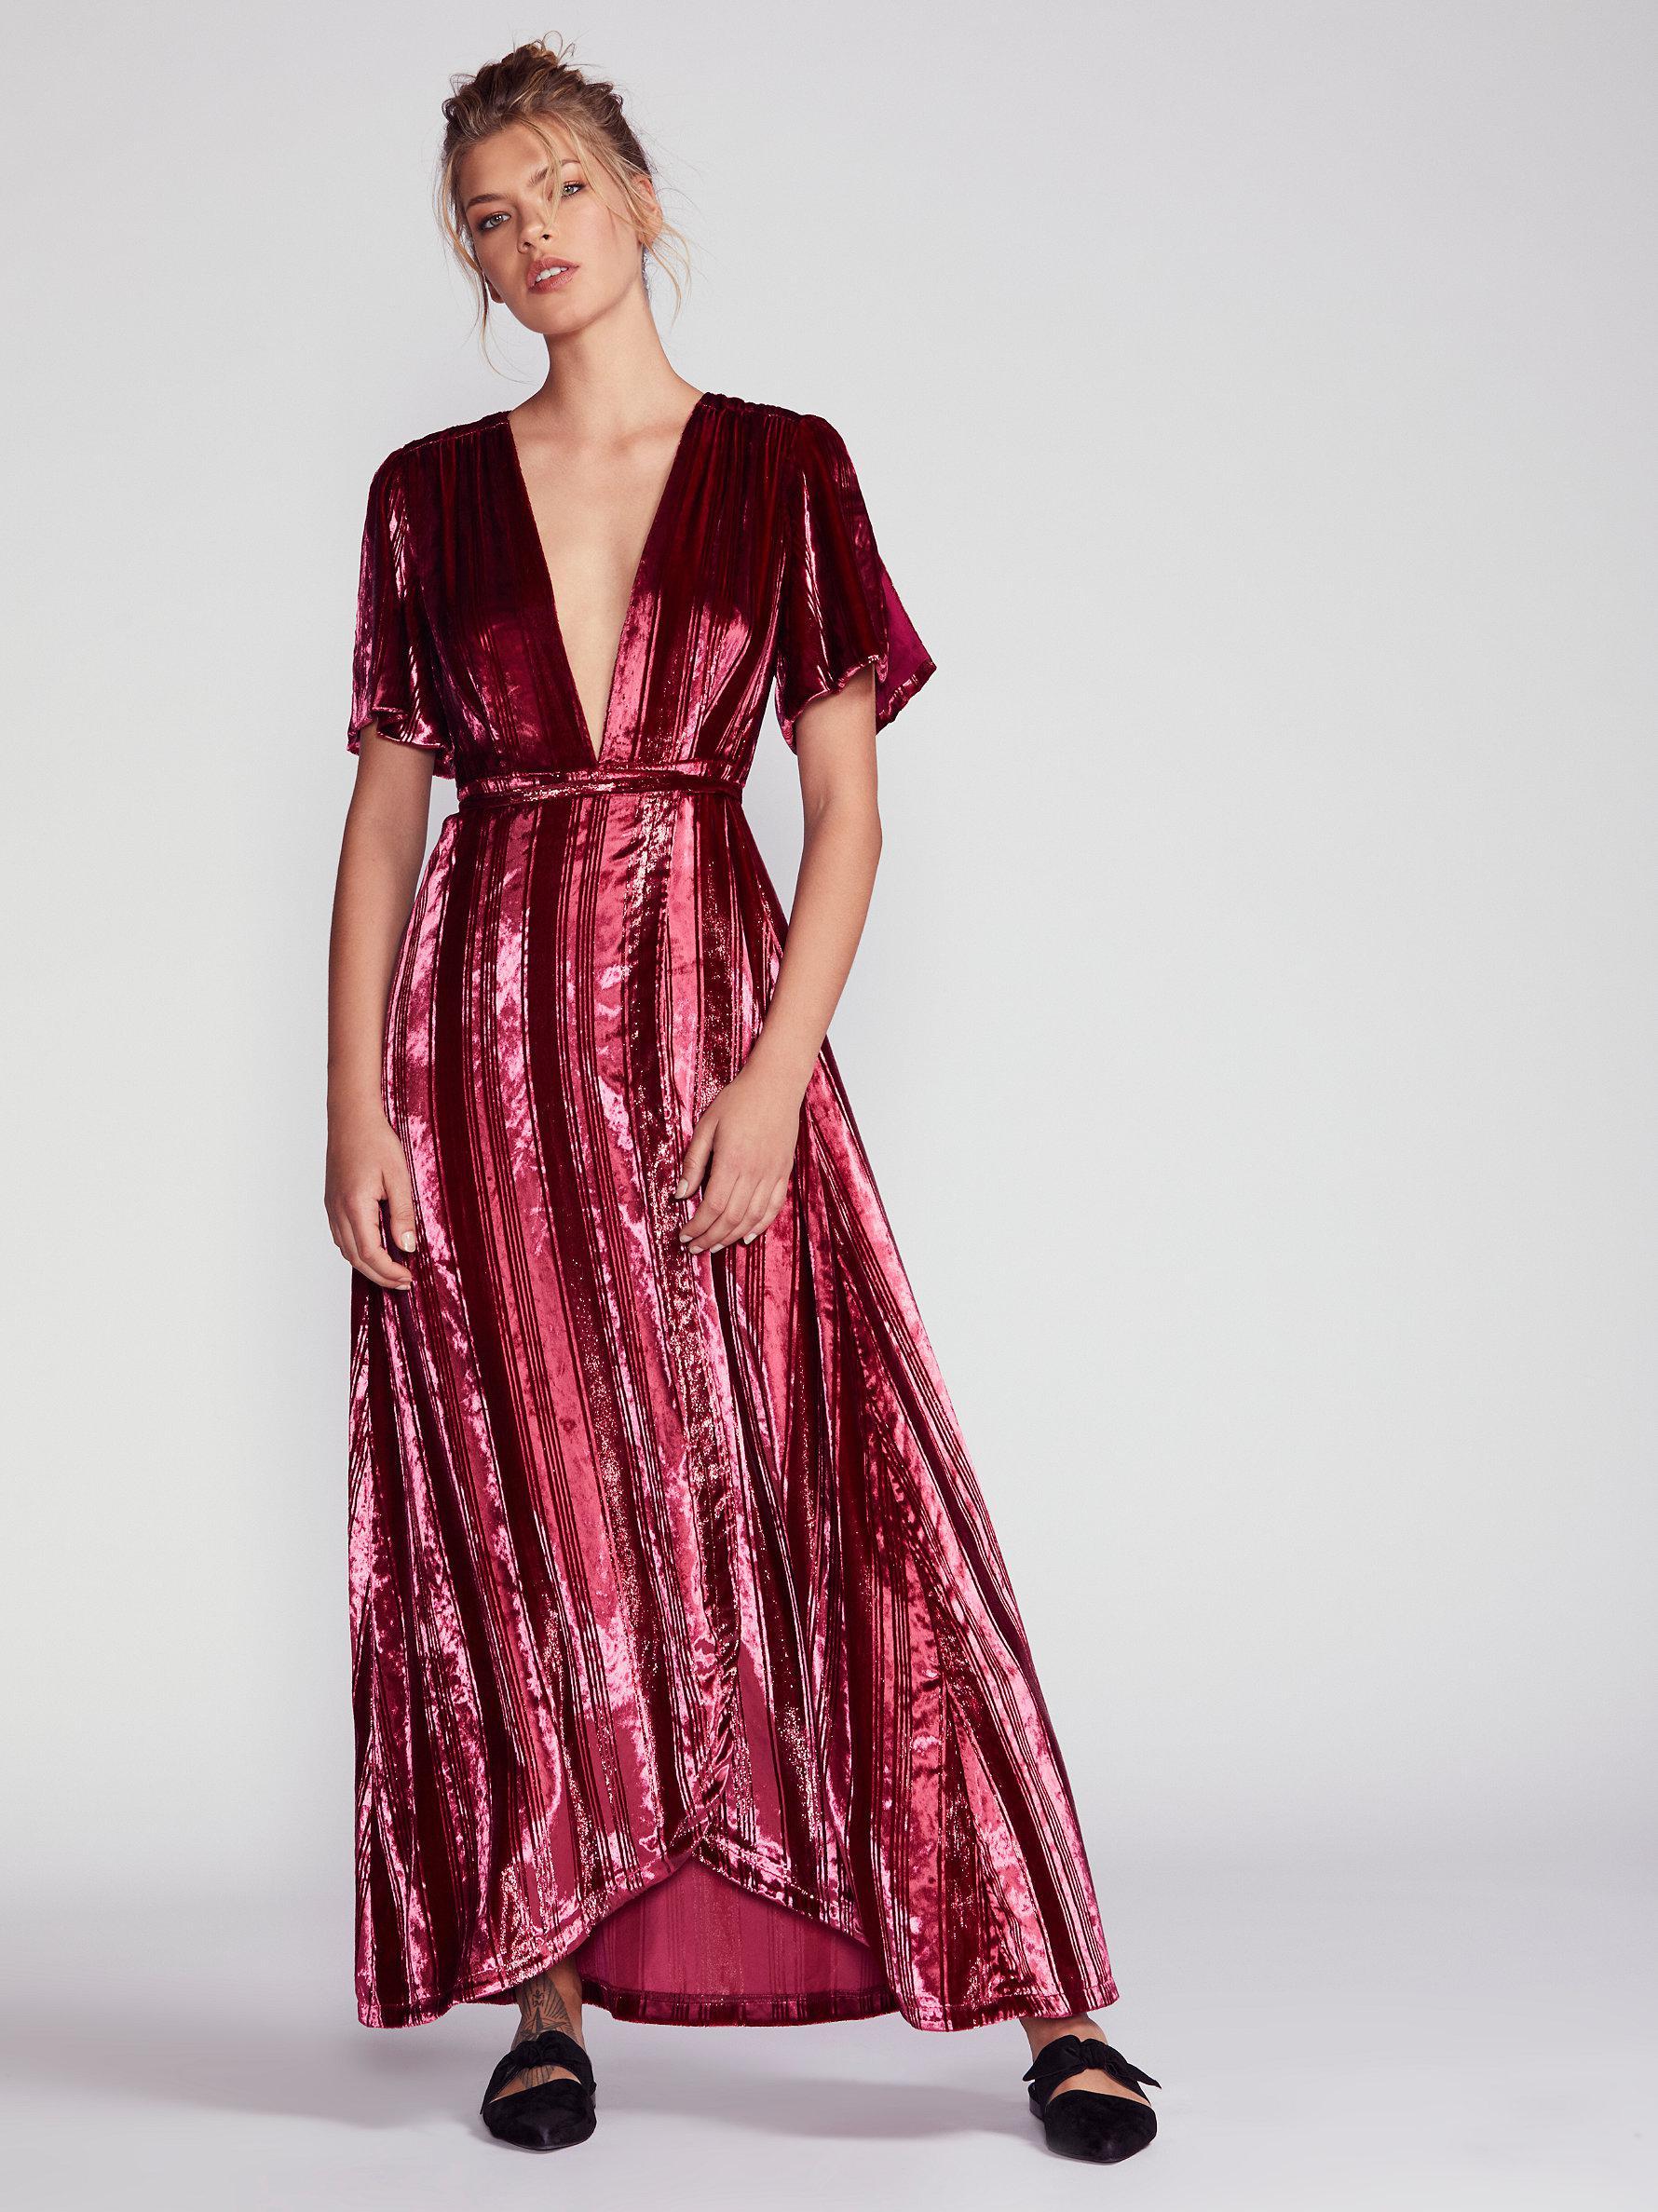 4b731890f94b Free People Kara Velvet Wrap Dress in Red - Lyst